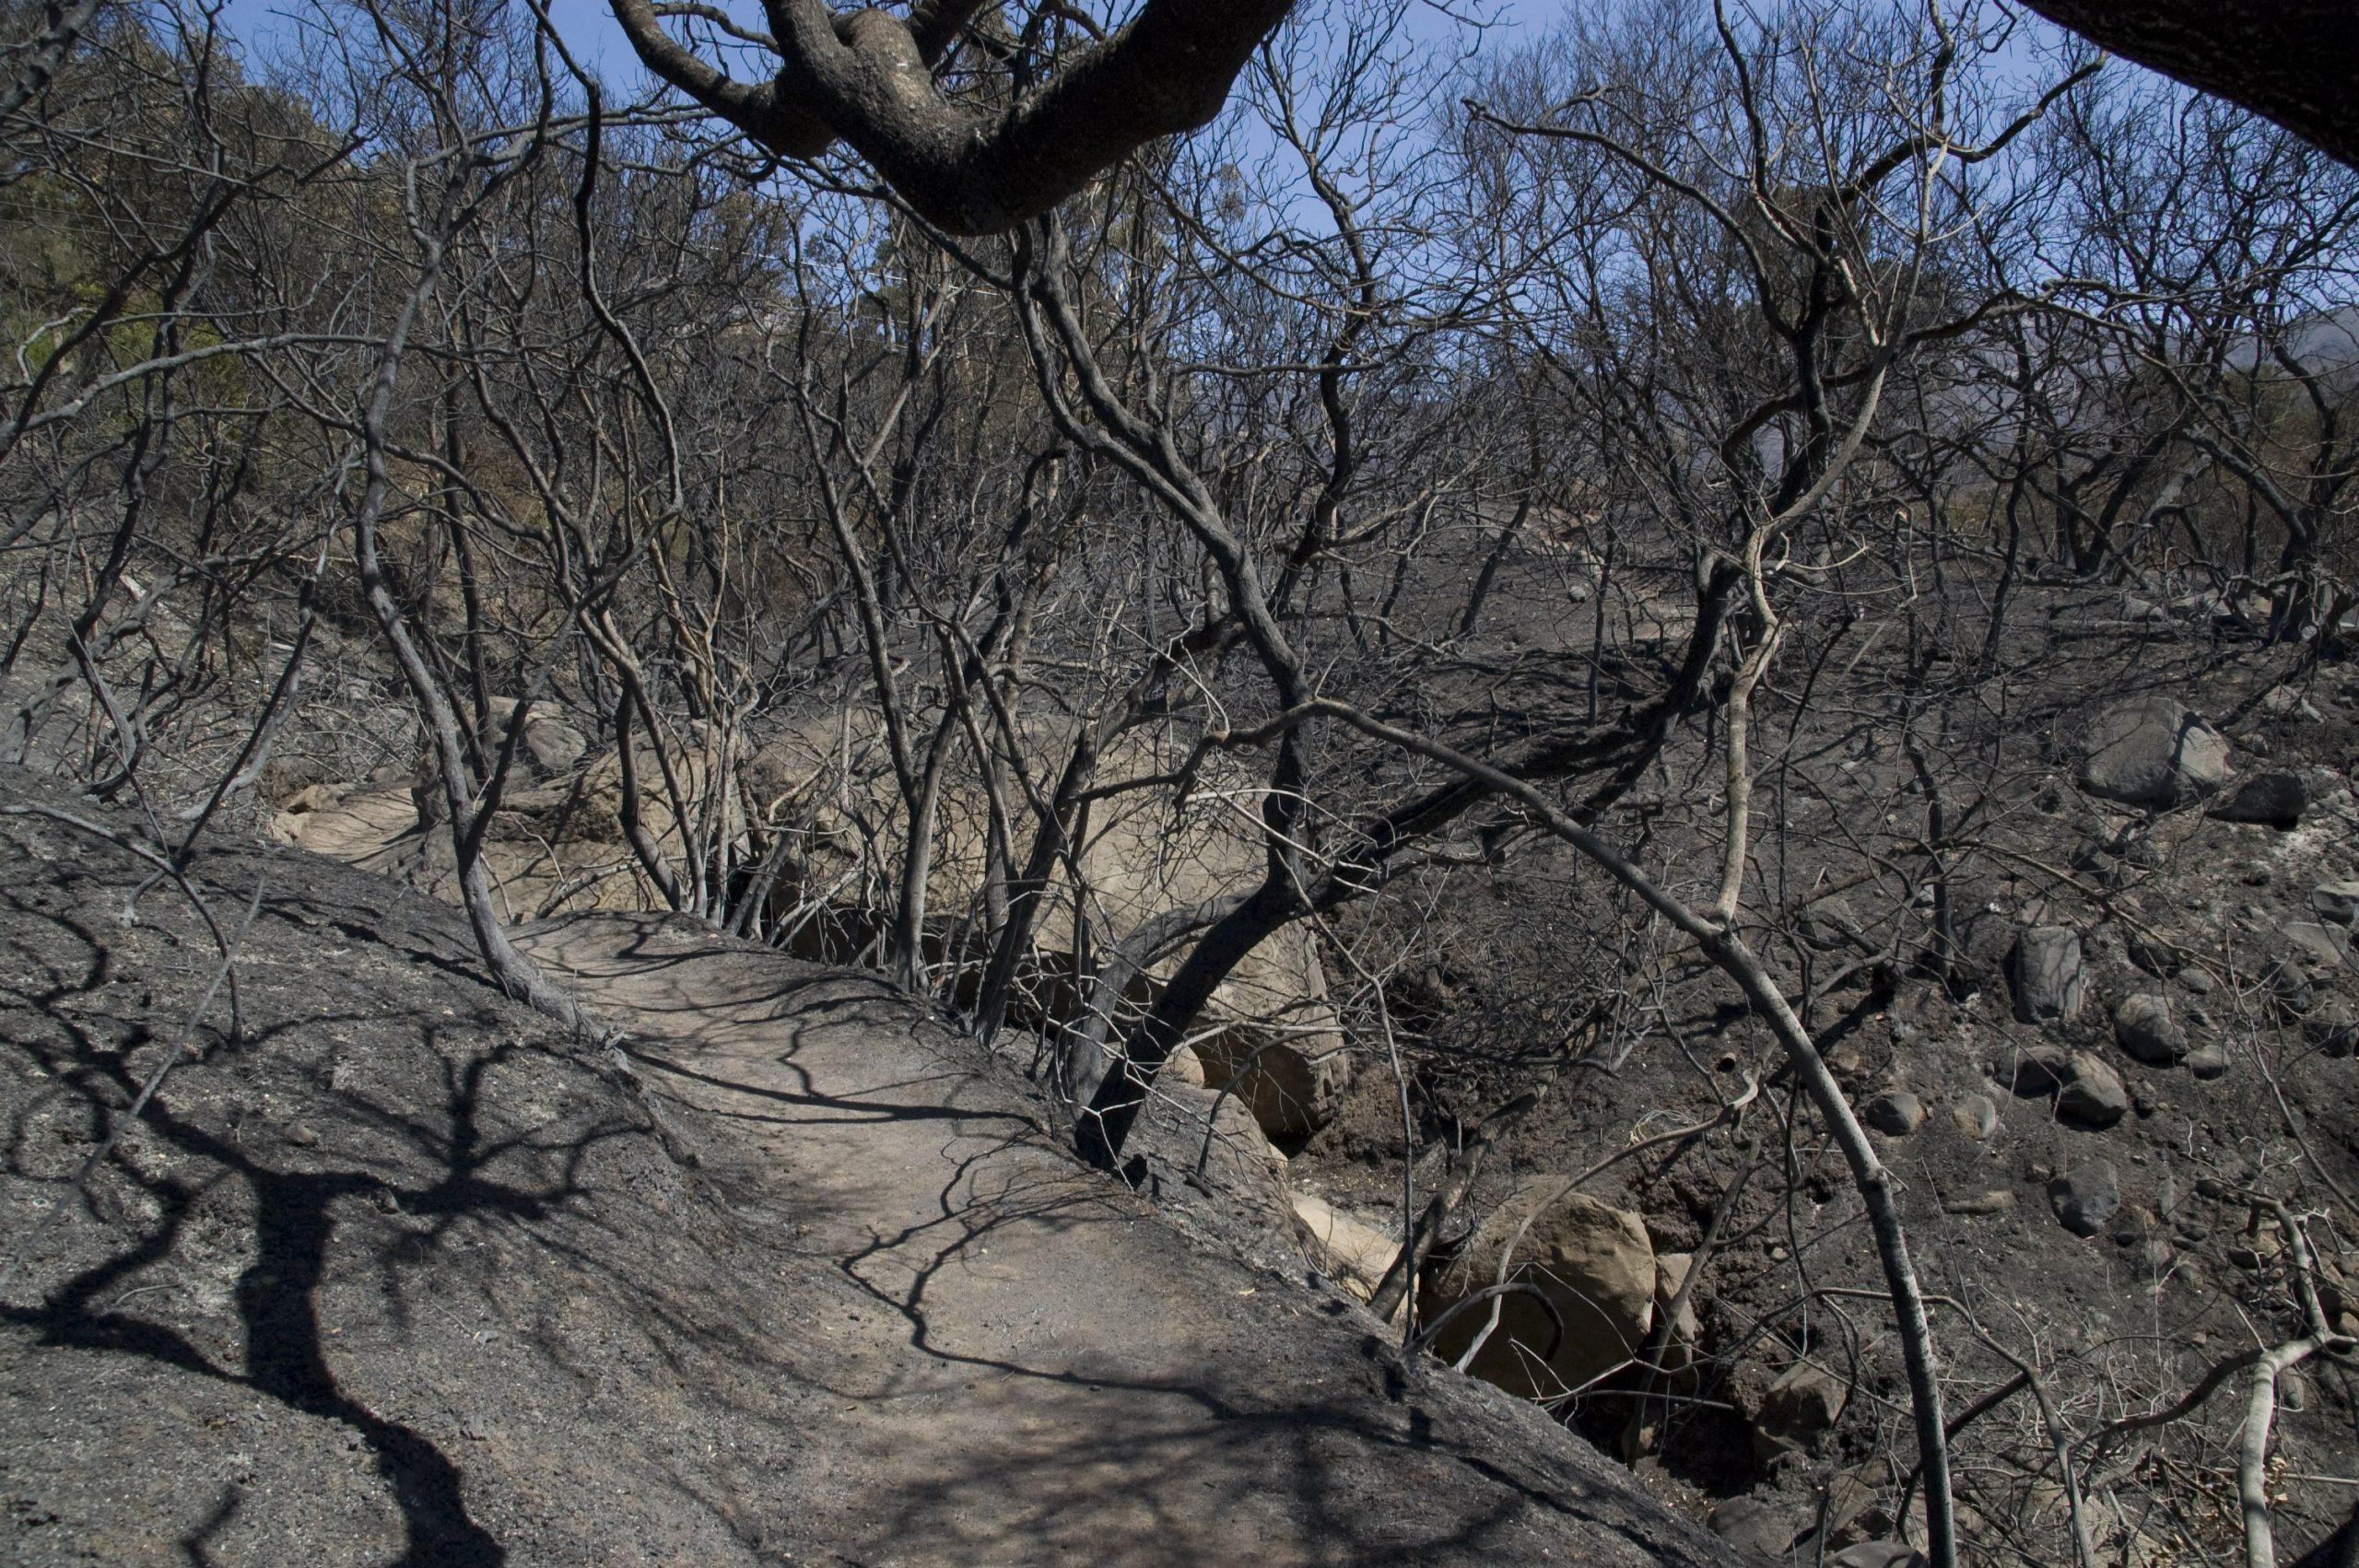 SBBG after Jesusita Fire. Jesusita Fire aftermath at Santa Barbara Botanic Garden, 2009.